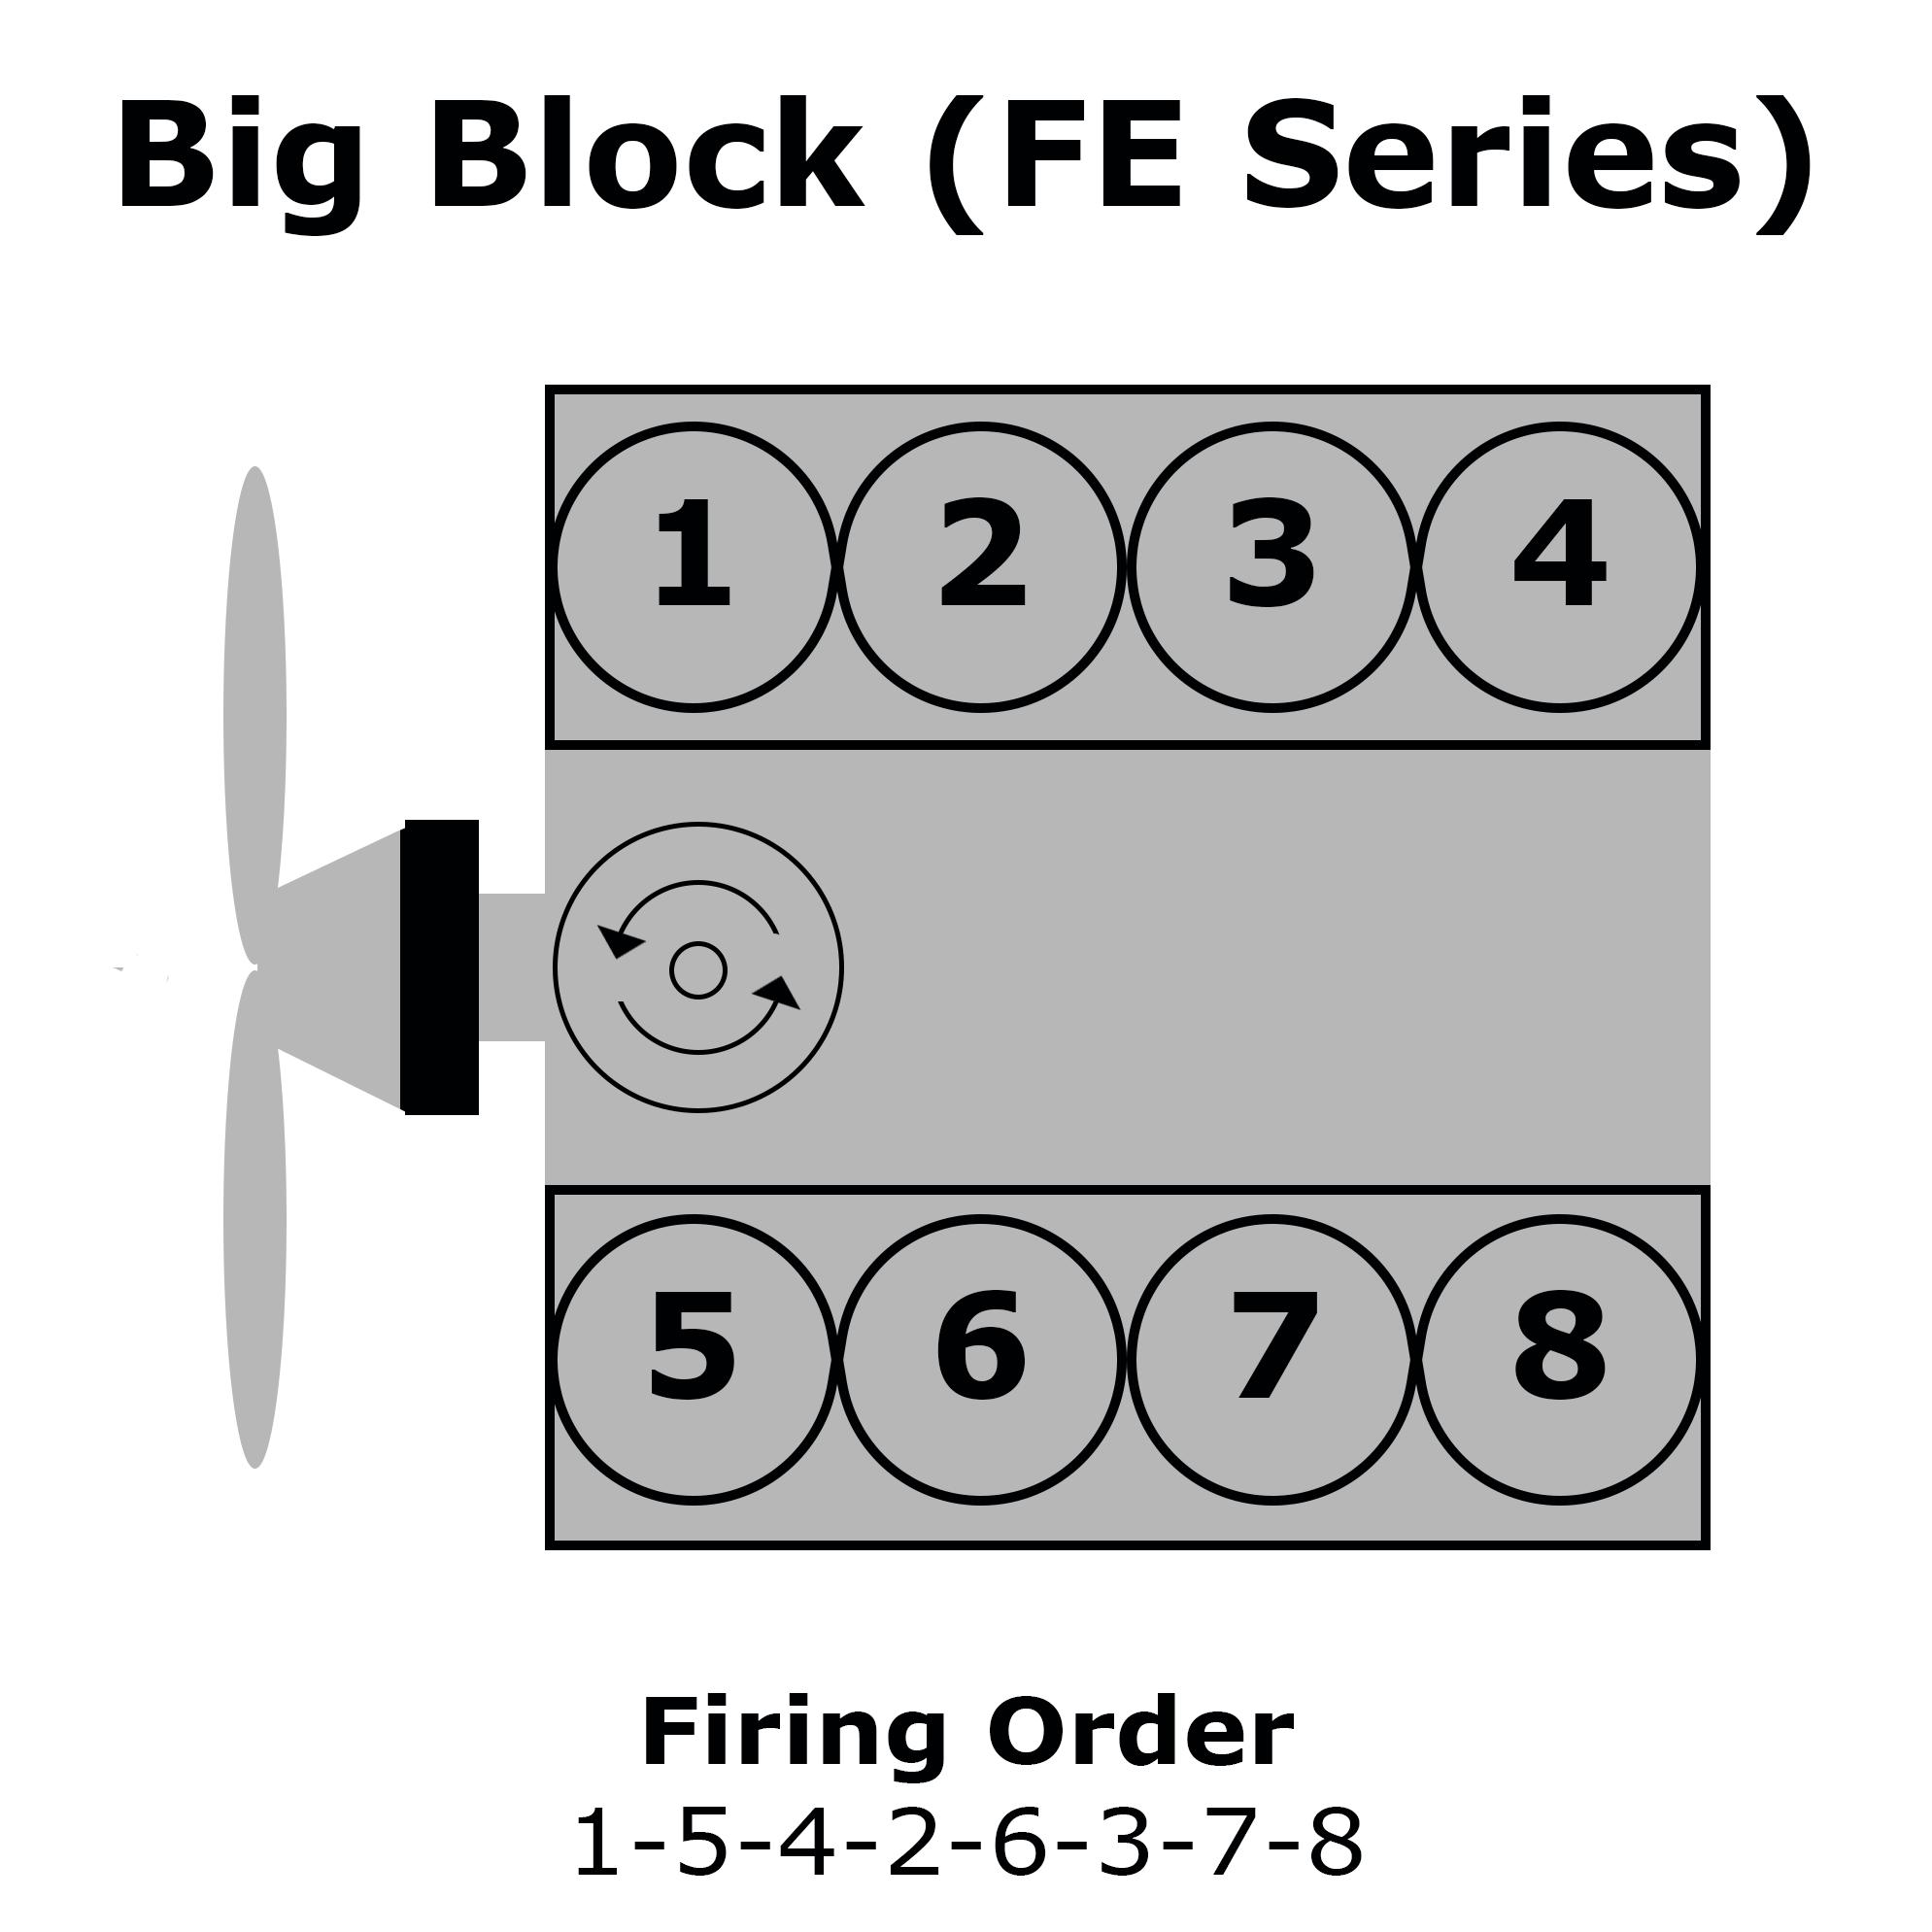 hight resolution of ford big block fe firing order ford 390 firing diagram